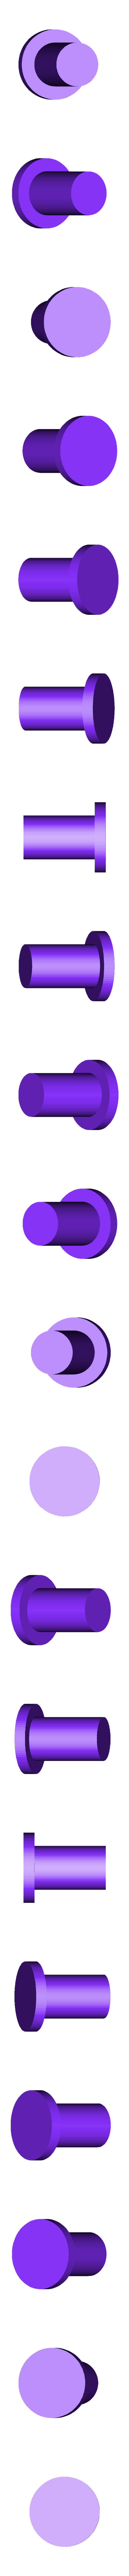 itsy-reset.stl Download free STL file NeoPixel LED Heart Necklace • 3D printable model, Adafruit